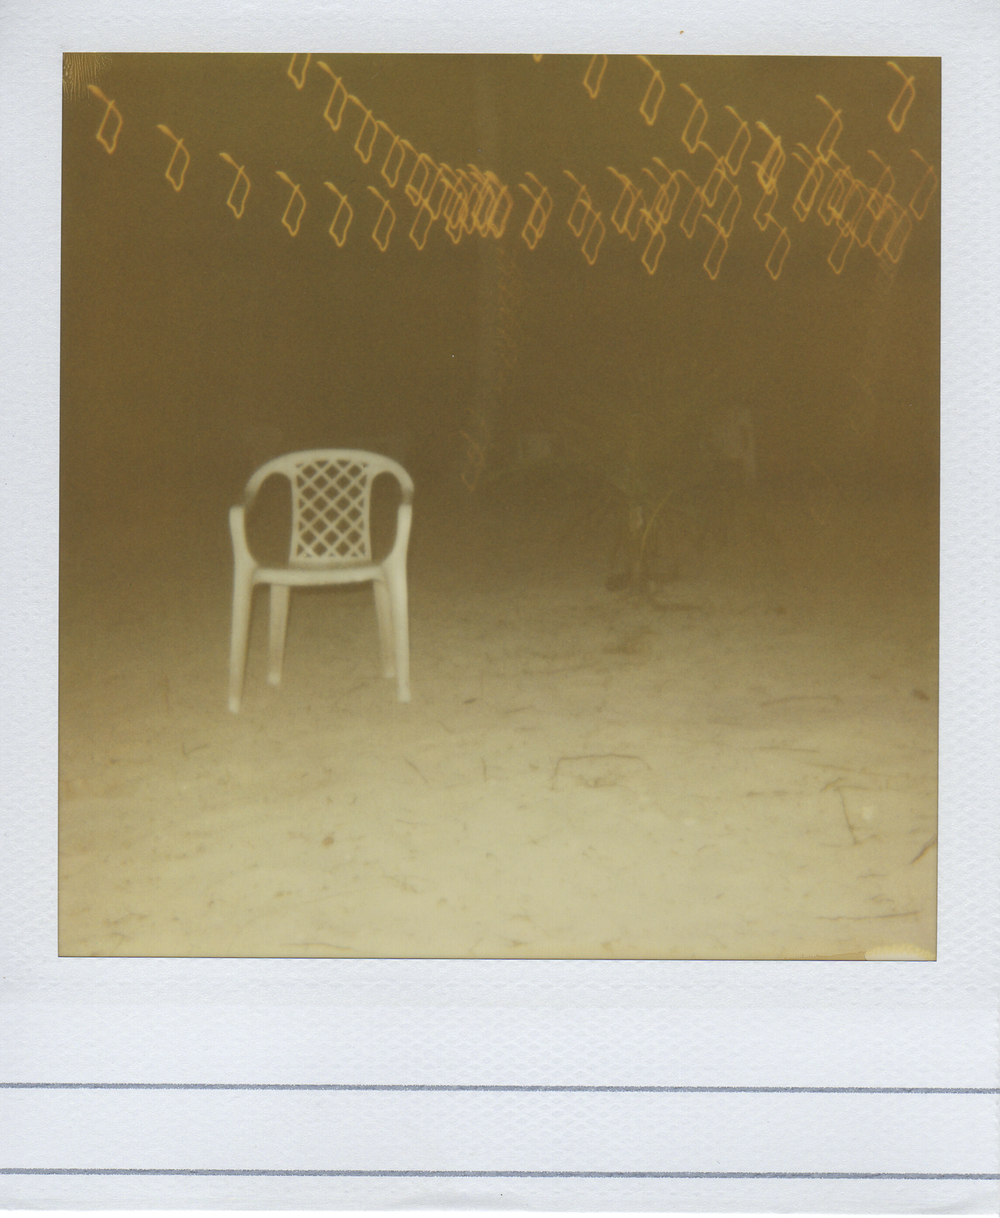 jlaurence-polaroid-090.jpg